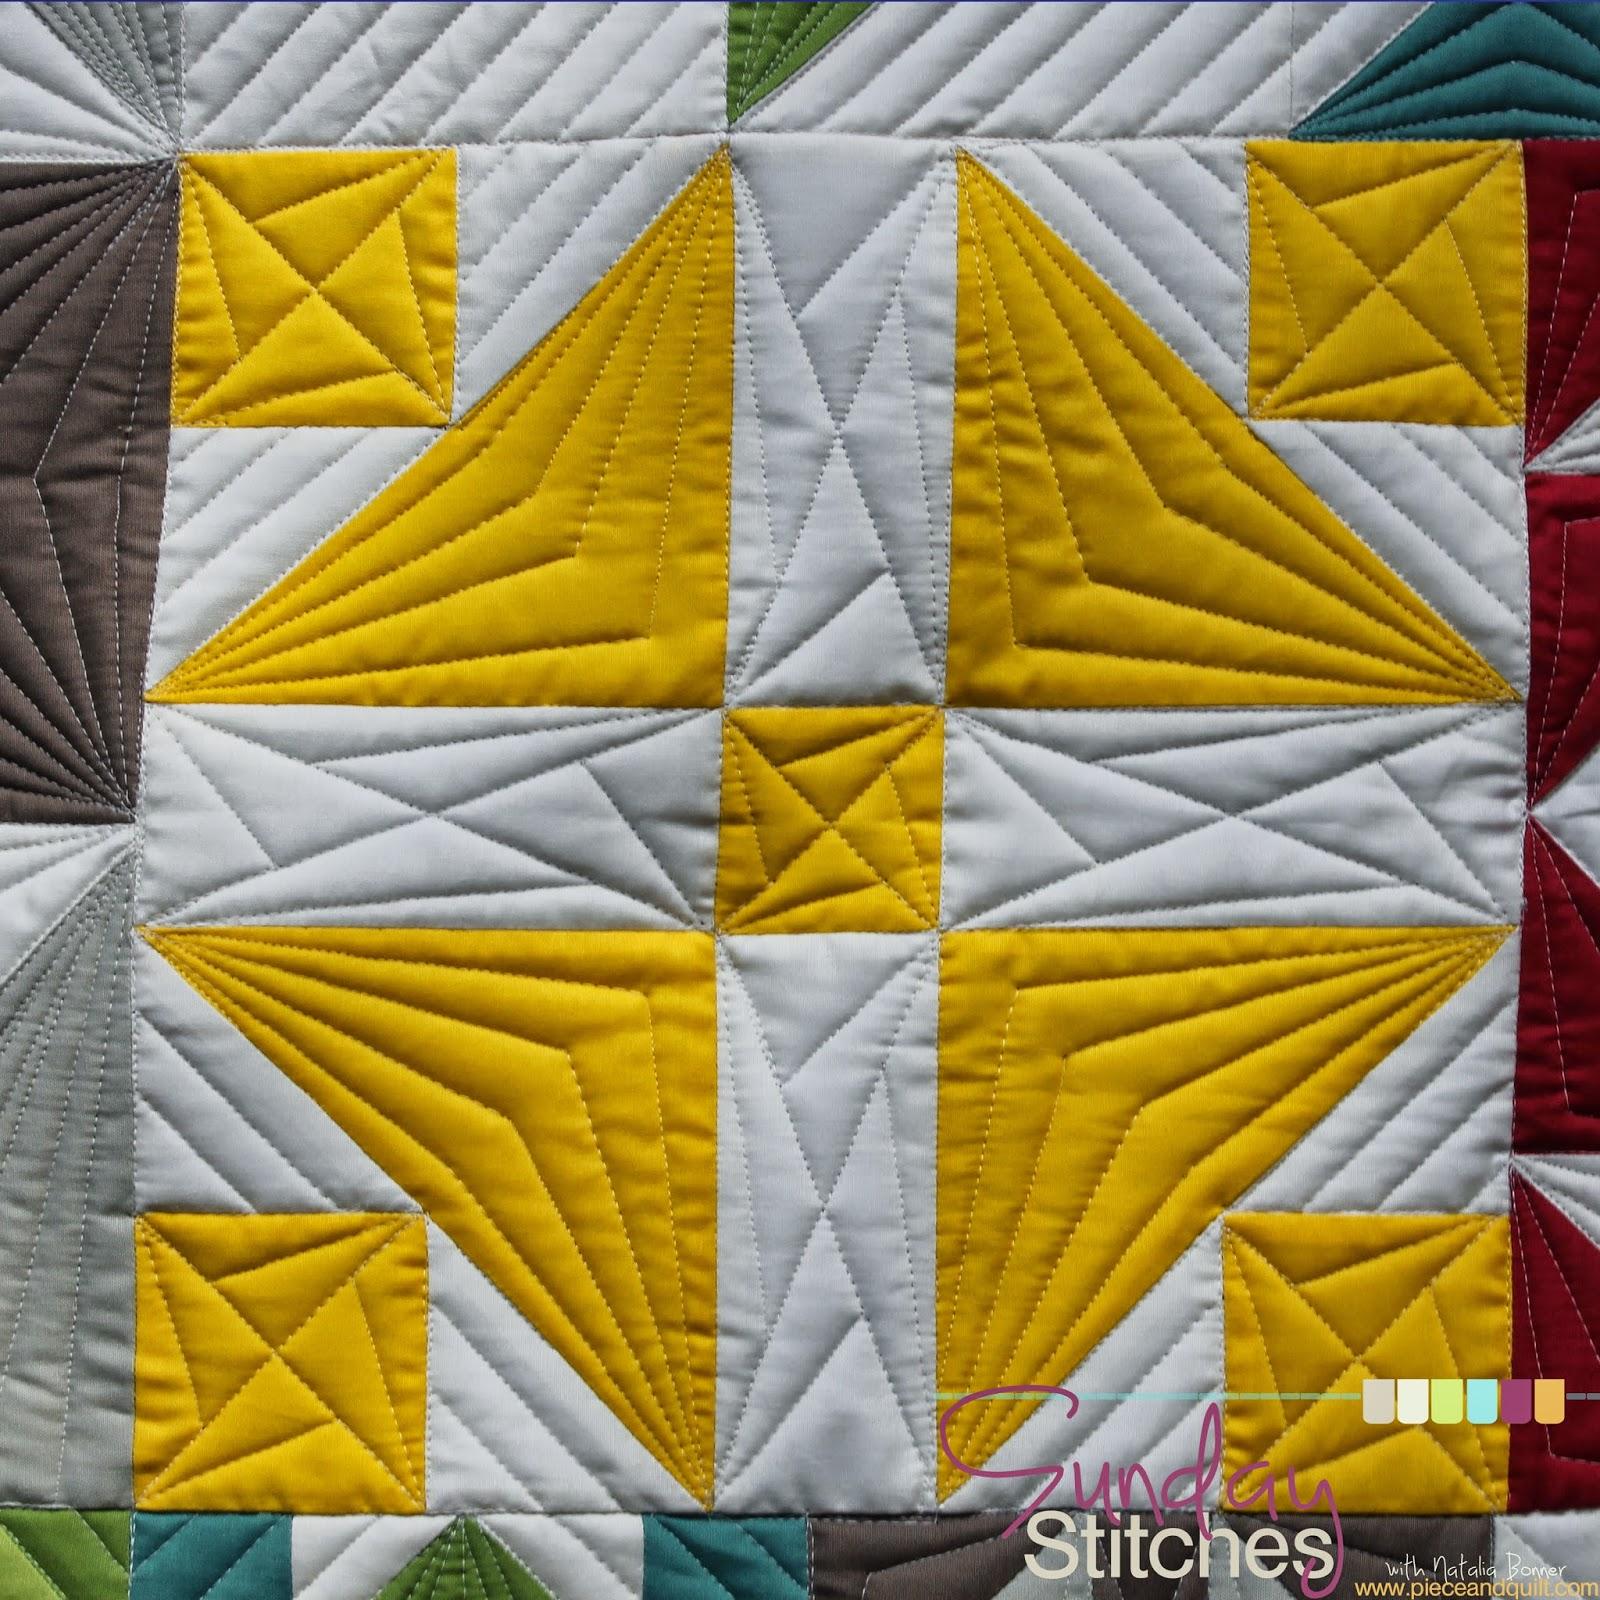 Modern Free Motion Quilting Patterns : Piece N Quilt: How To: Free-Motion Quilt a Modern Pinwheel Block - Sunday Stitches